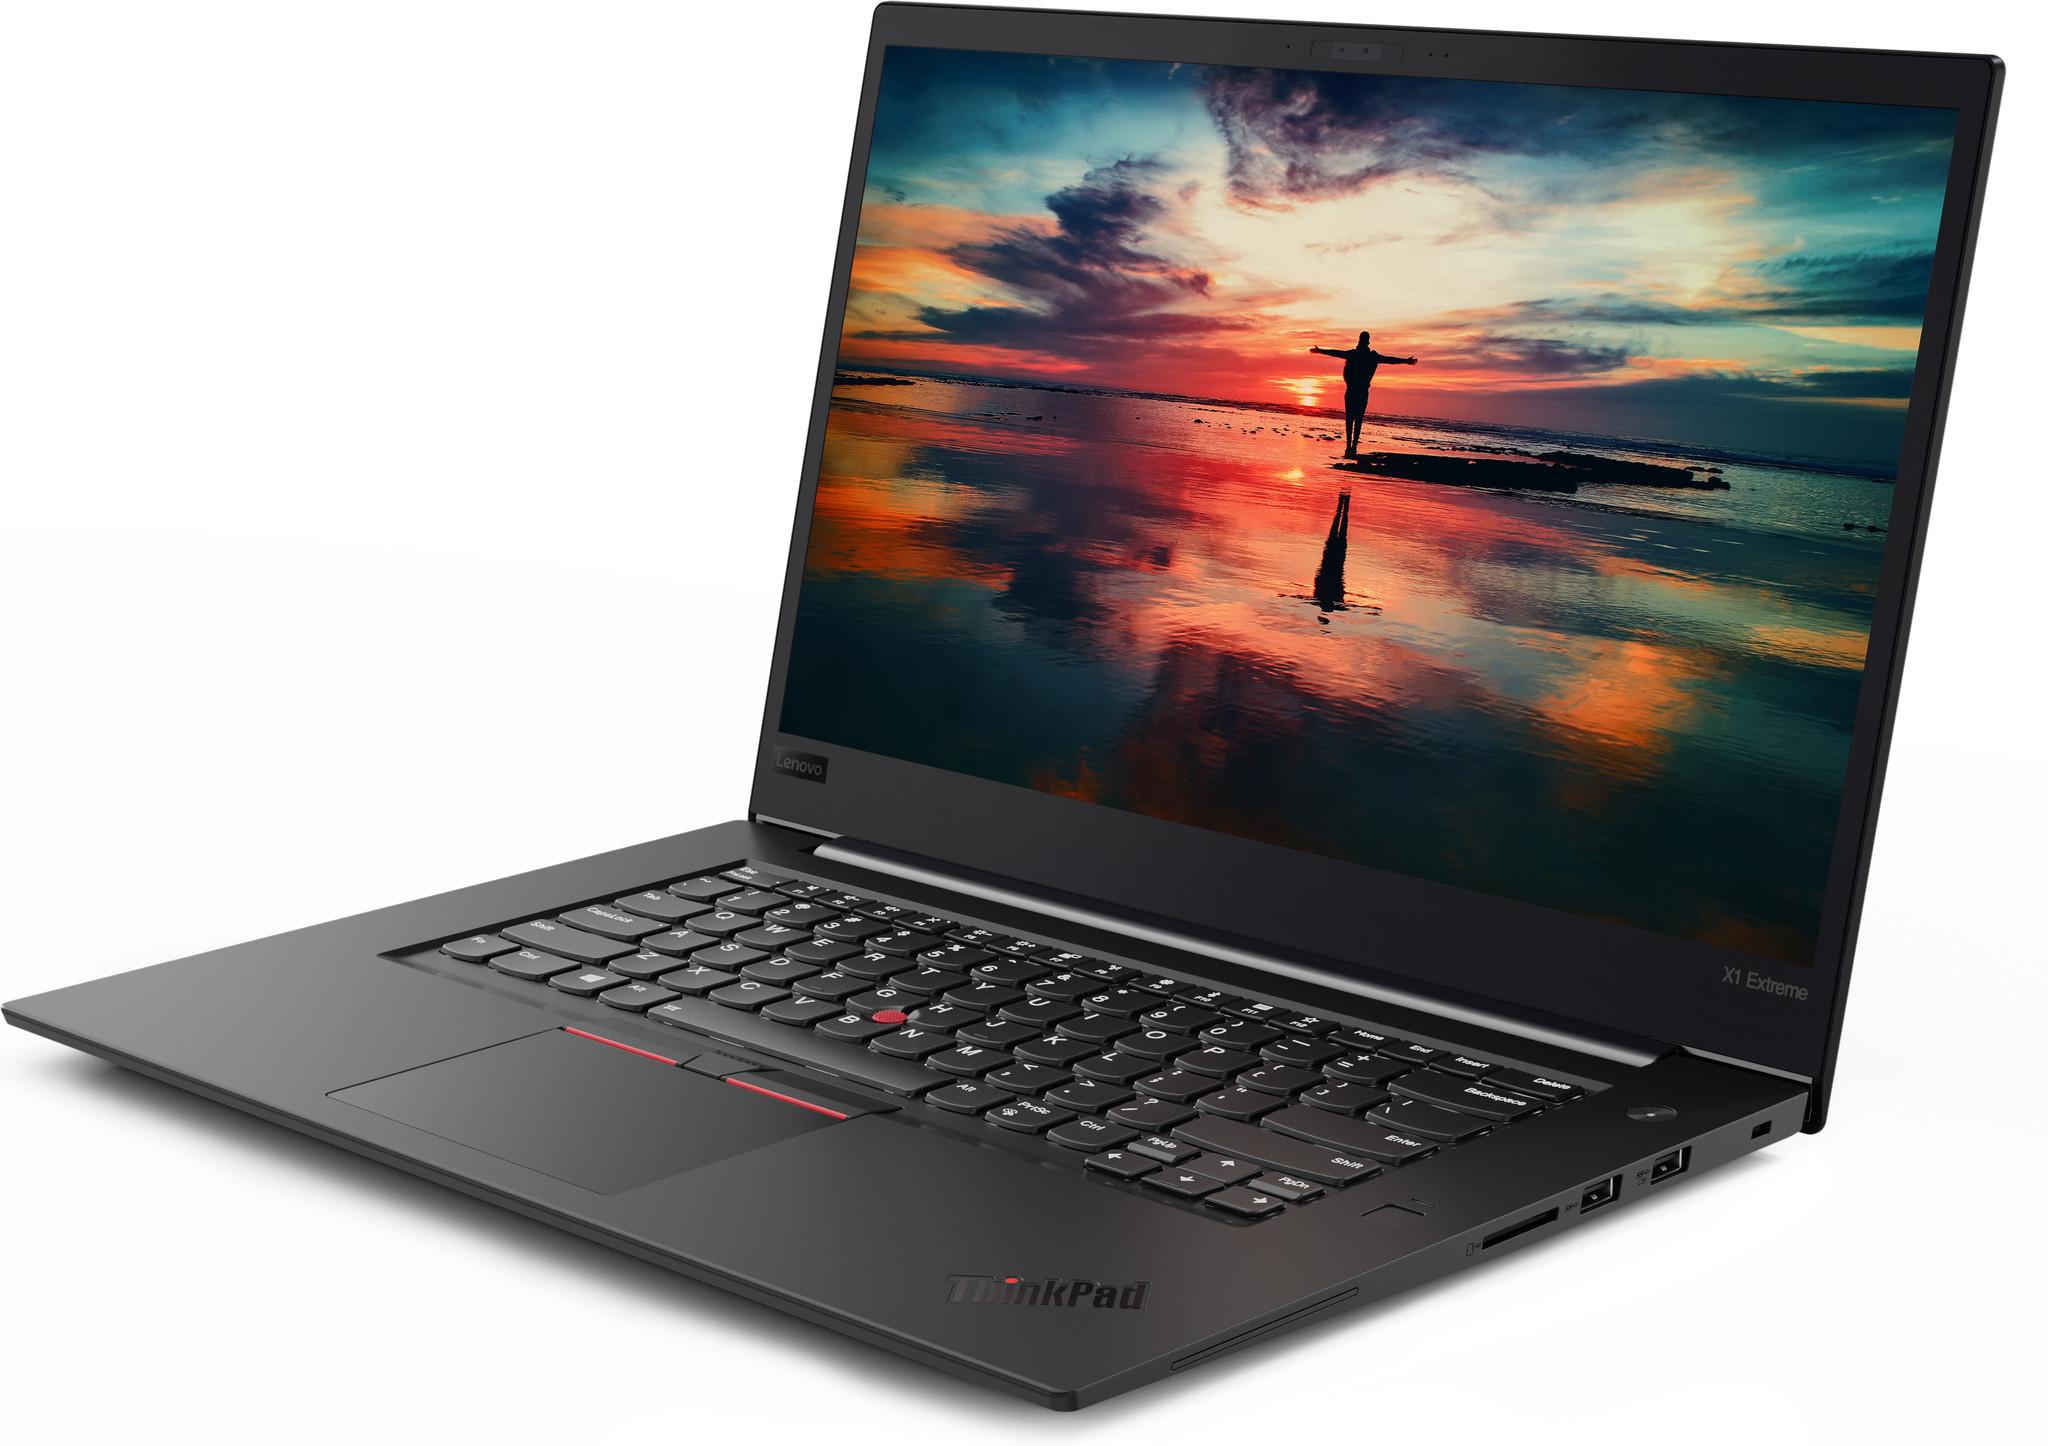 Lenovo Thinkpad X1 Extreme - 20MF000WMH